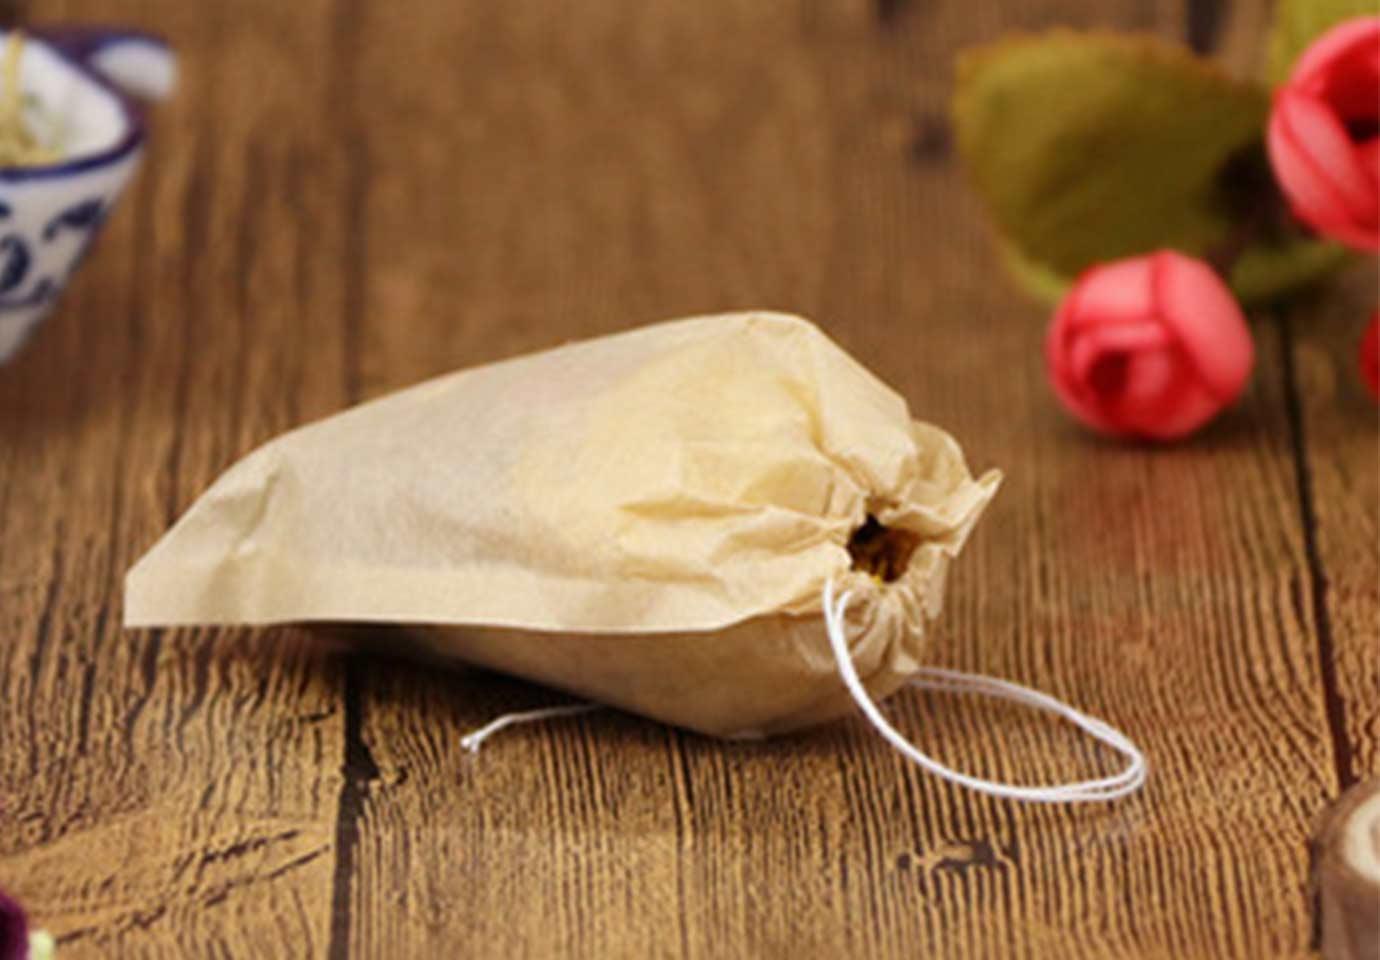 » Filter paper tea bag